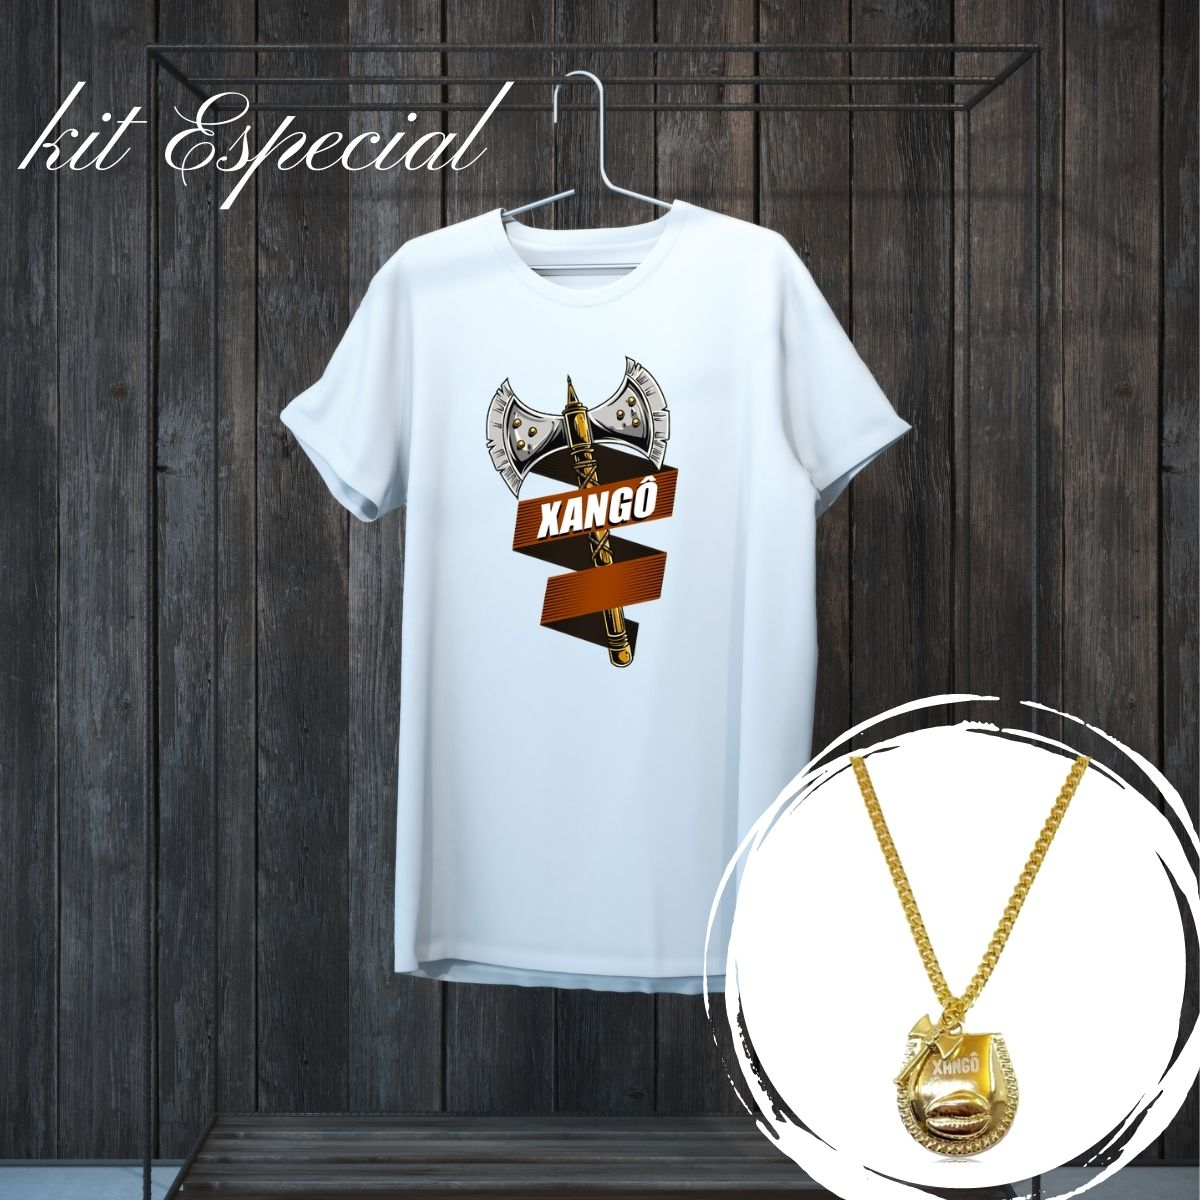 Kit de Xangô - Colar Patuá e Camiseta